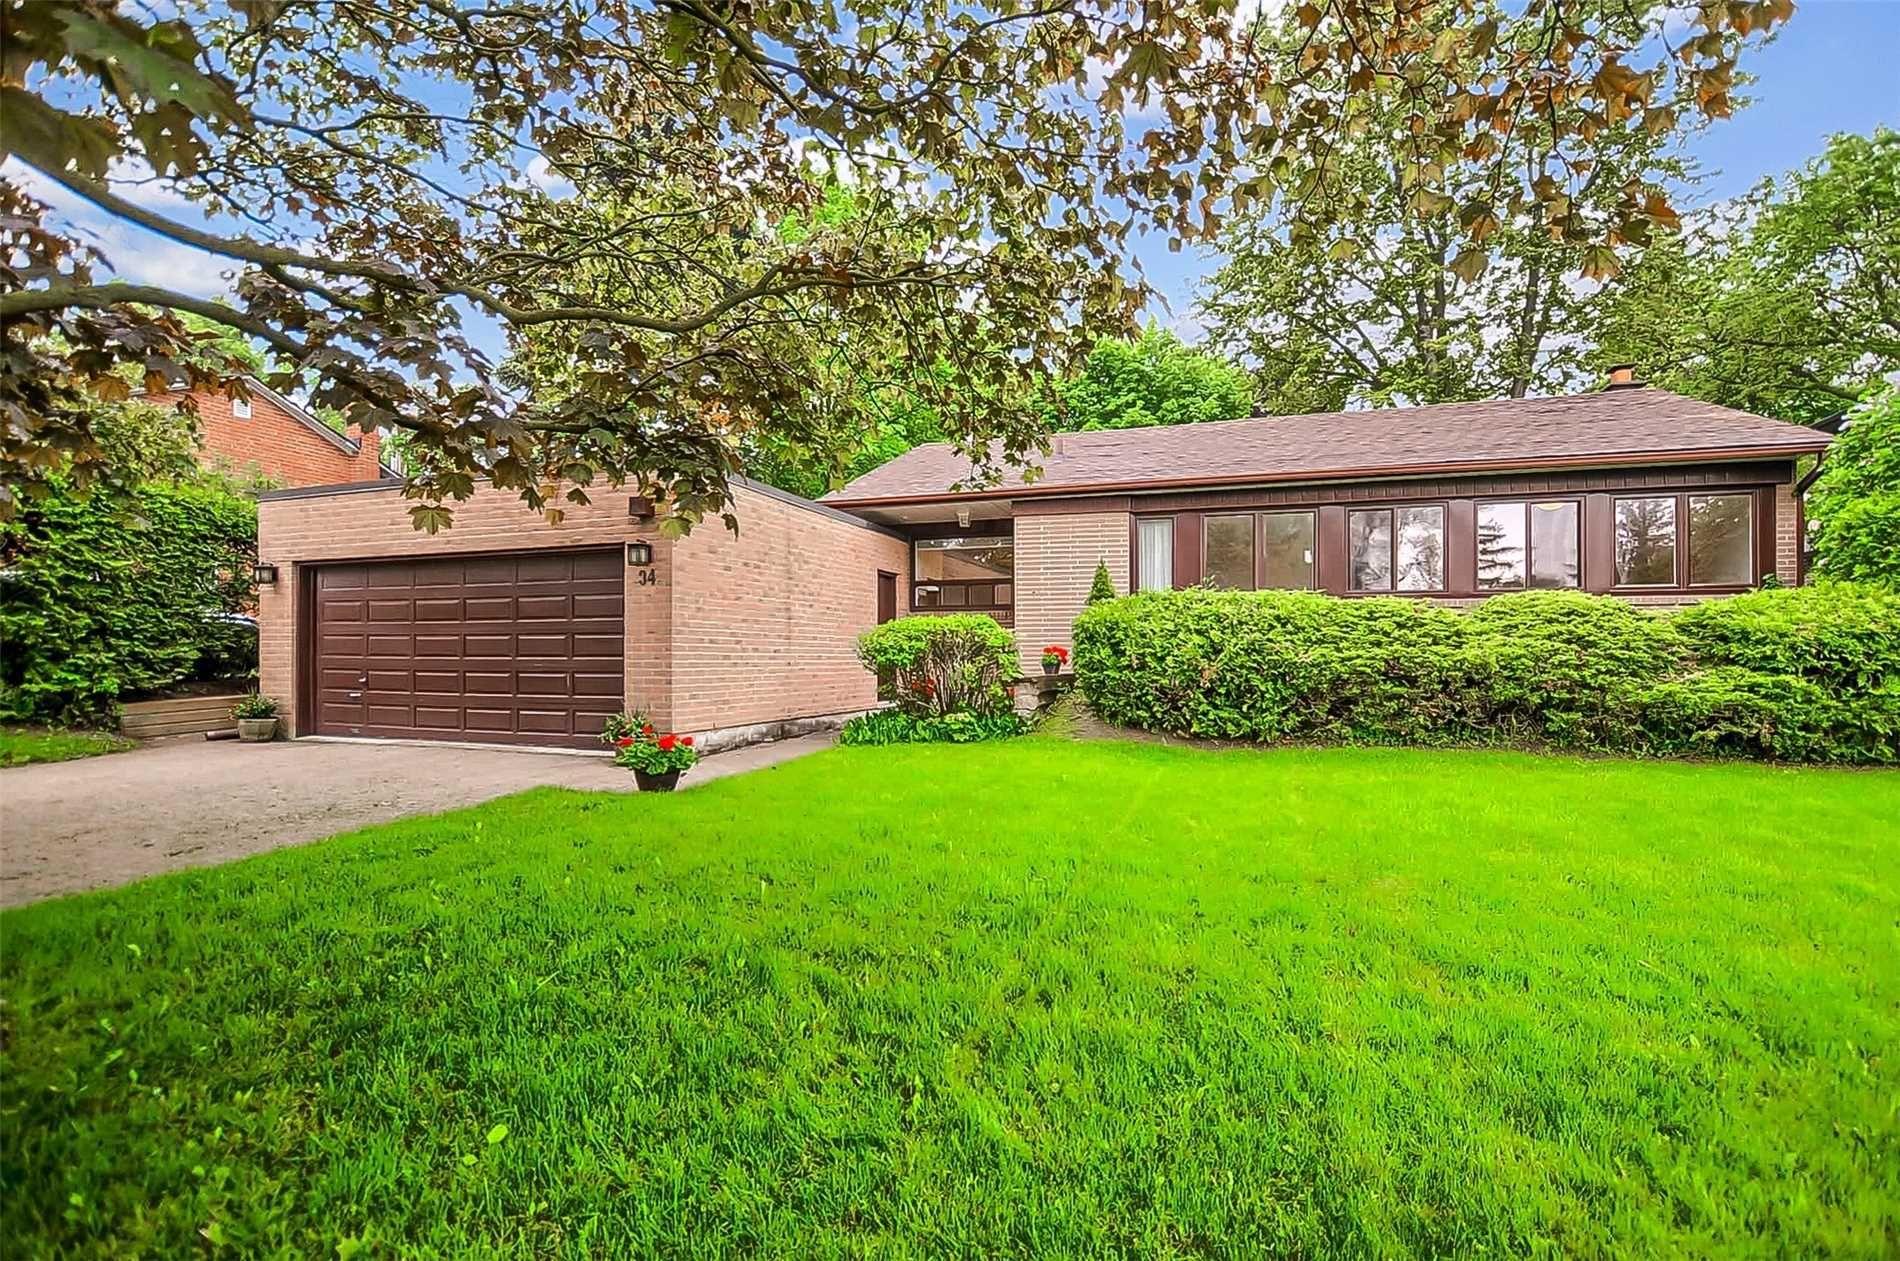 Main Photo: 34 Sanderling Place in Toronto: Banbury-Don Mills House (Bungalow-Raised) for sale (Toronto C13)  : MLS®# C4482488